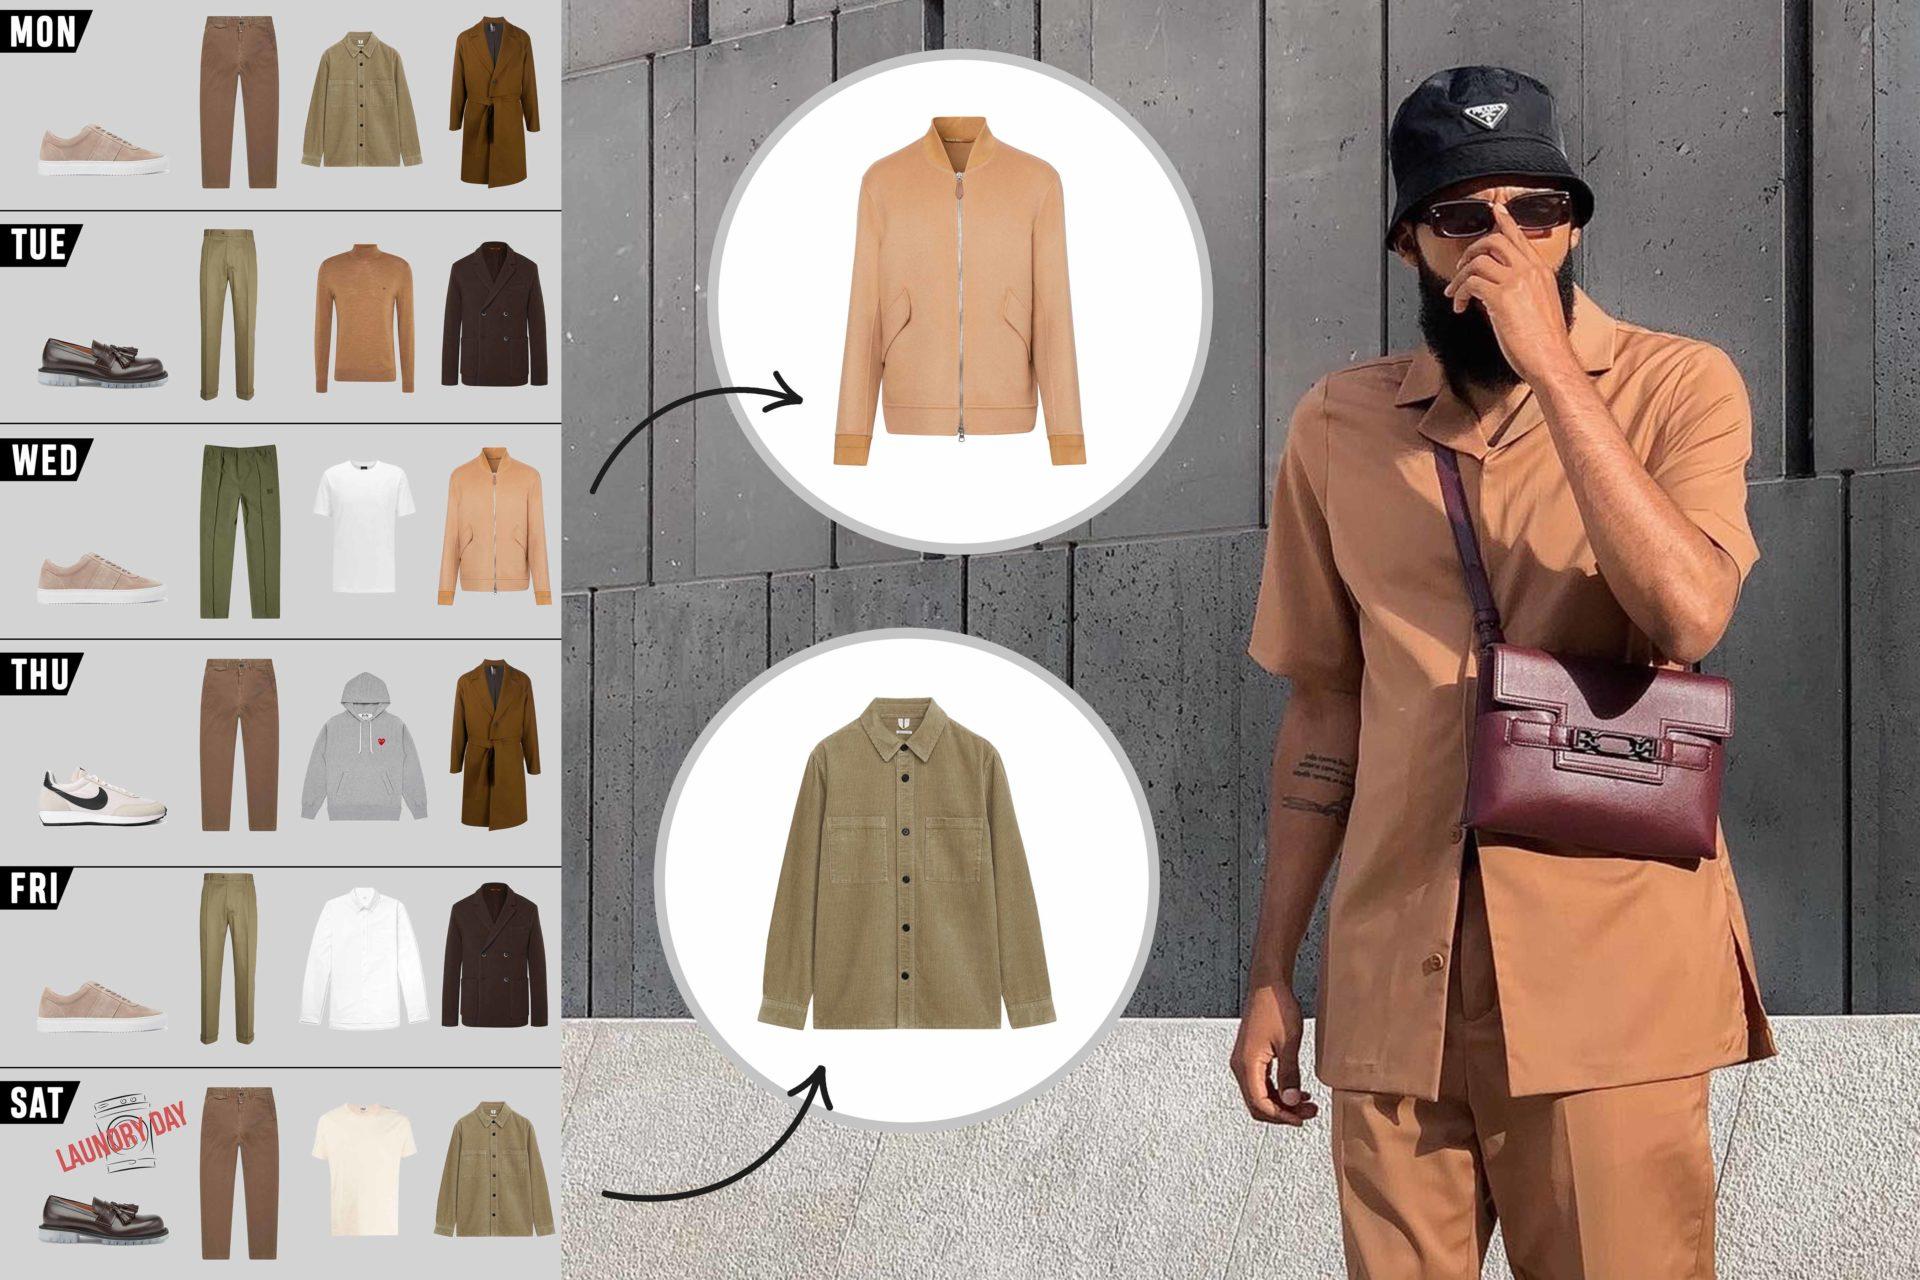 Minimalist Capsule Wardrobe for men